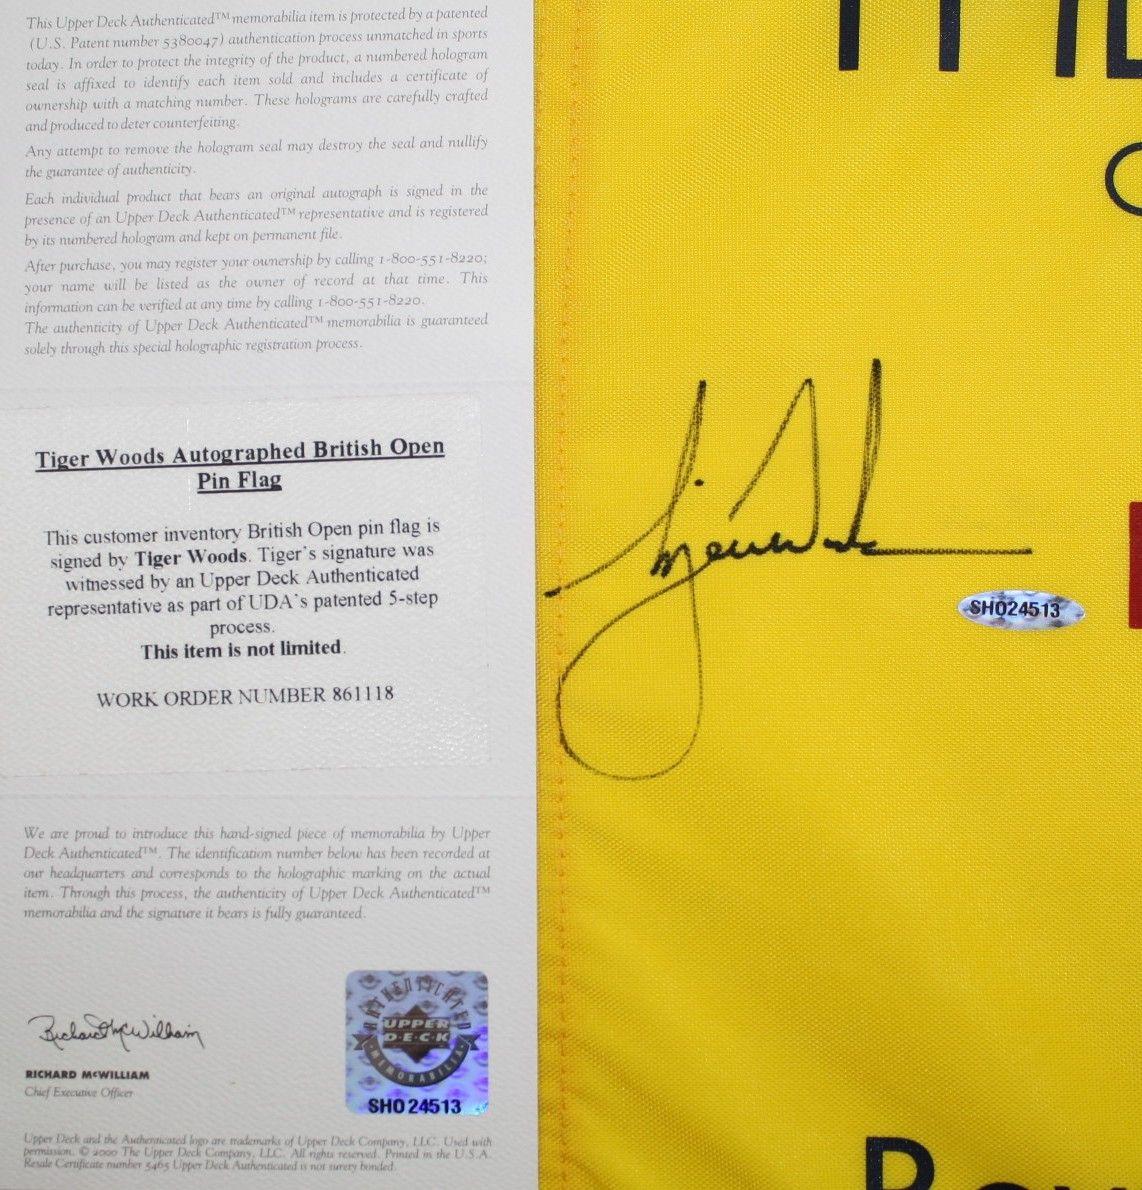 lot detail - tiger woods signed 2006 british open flag - royal liverpool